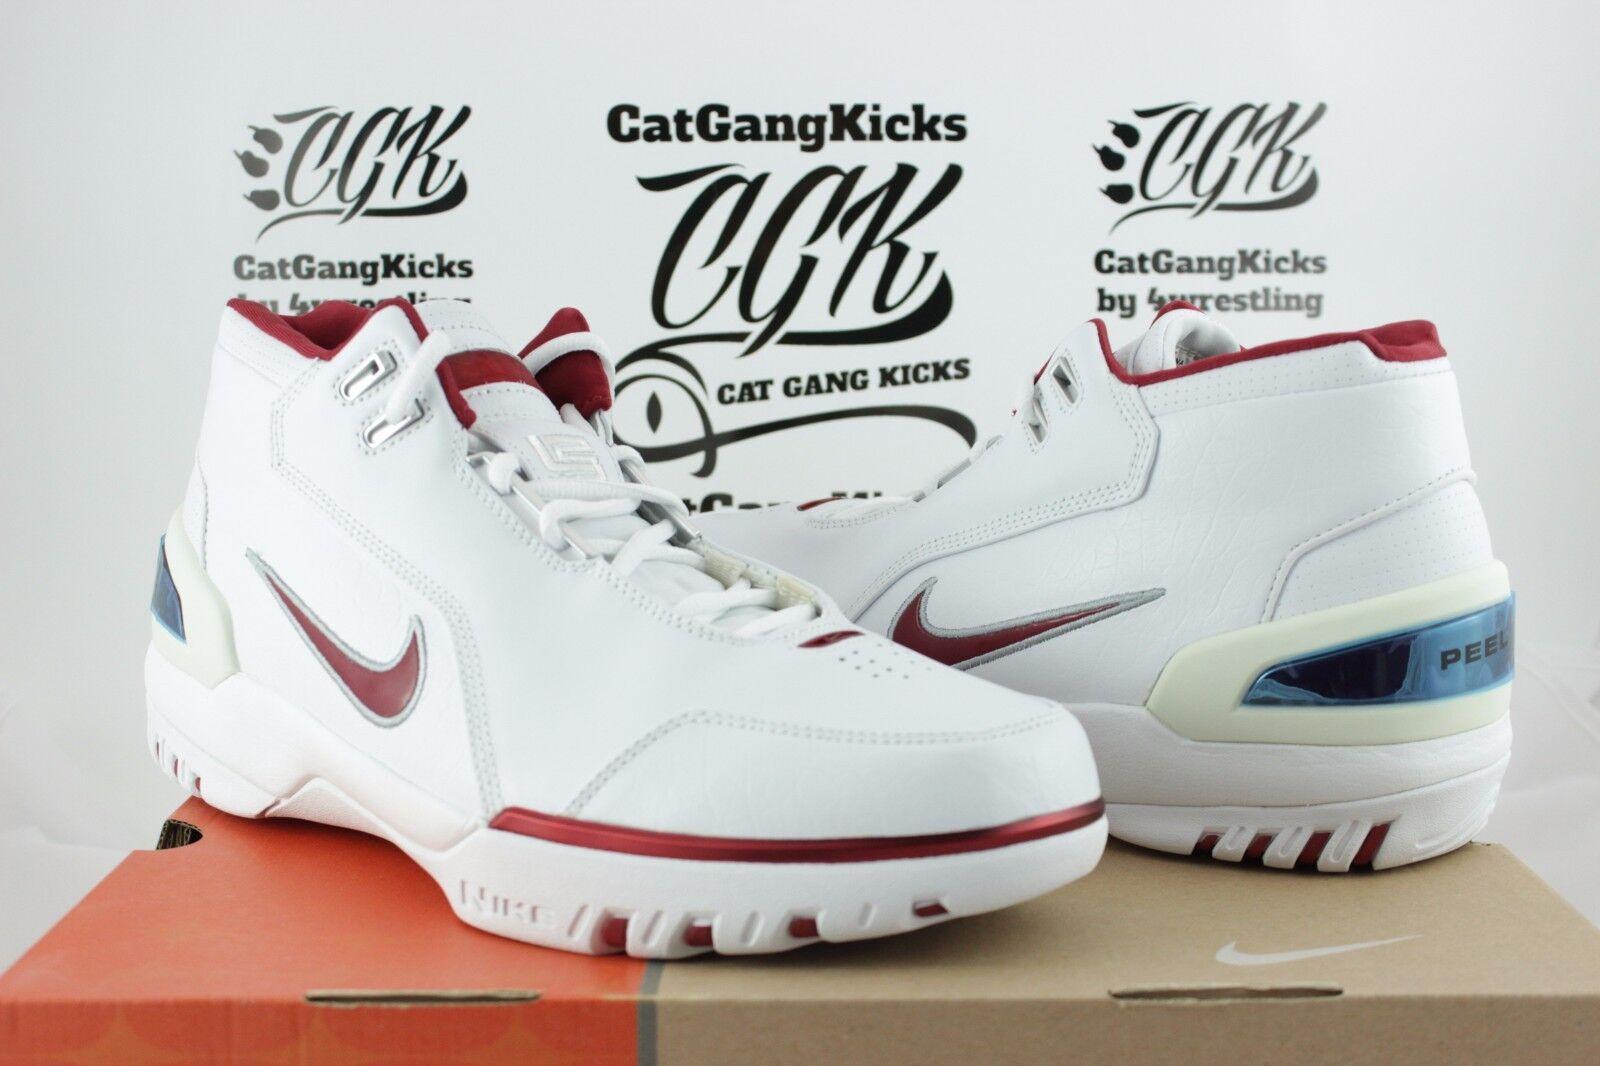 2004 OG DS Nike Air Zoom Generation AZG LeBron James bianca Crimson 308214 161